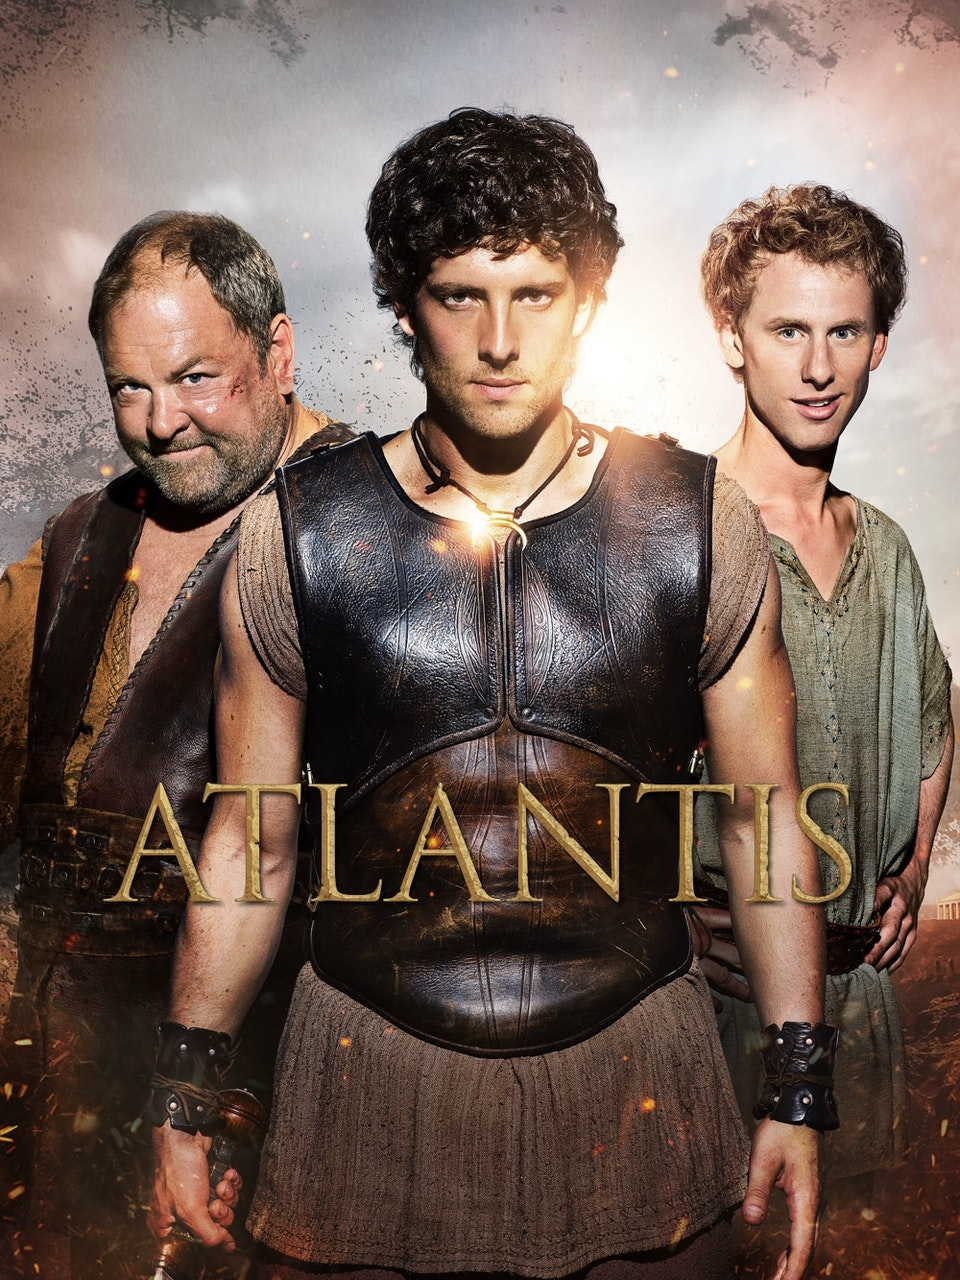 Atlantis (BBC One/BBC America)